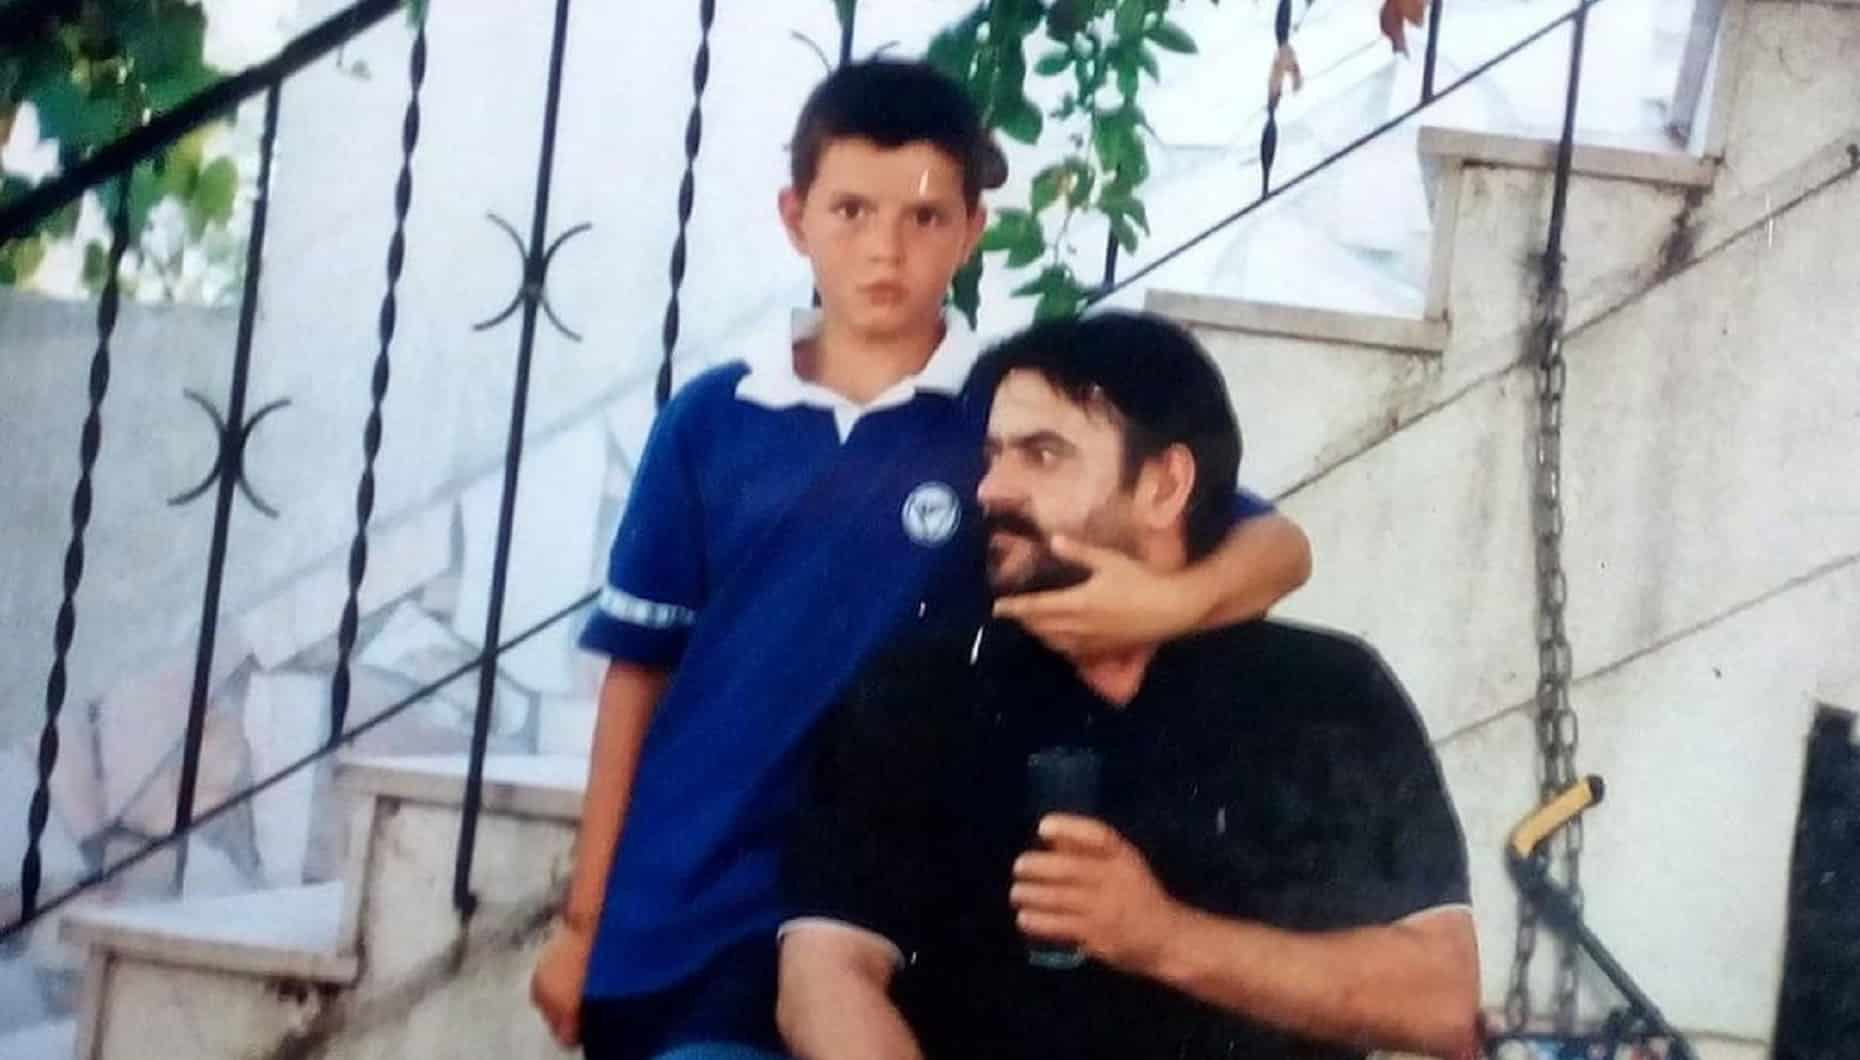 Marco Costa, Pai